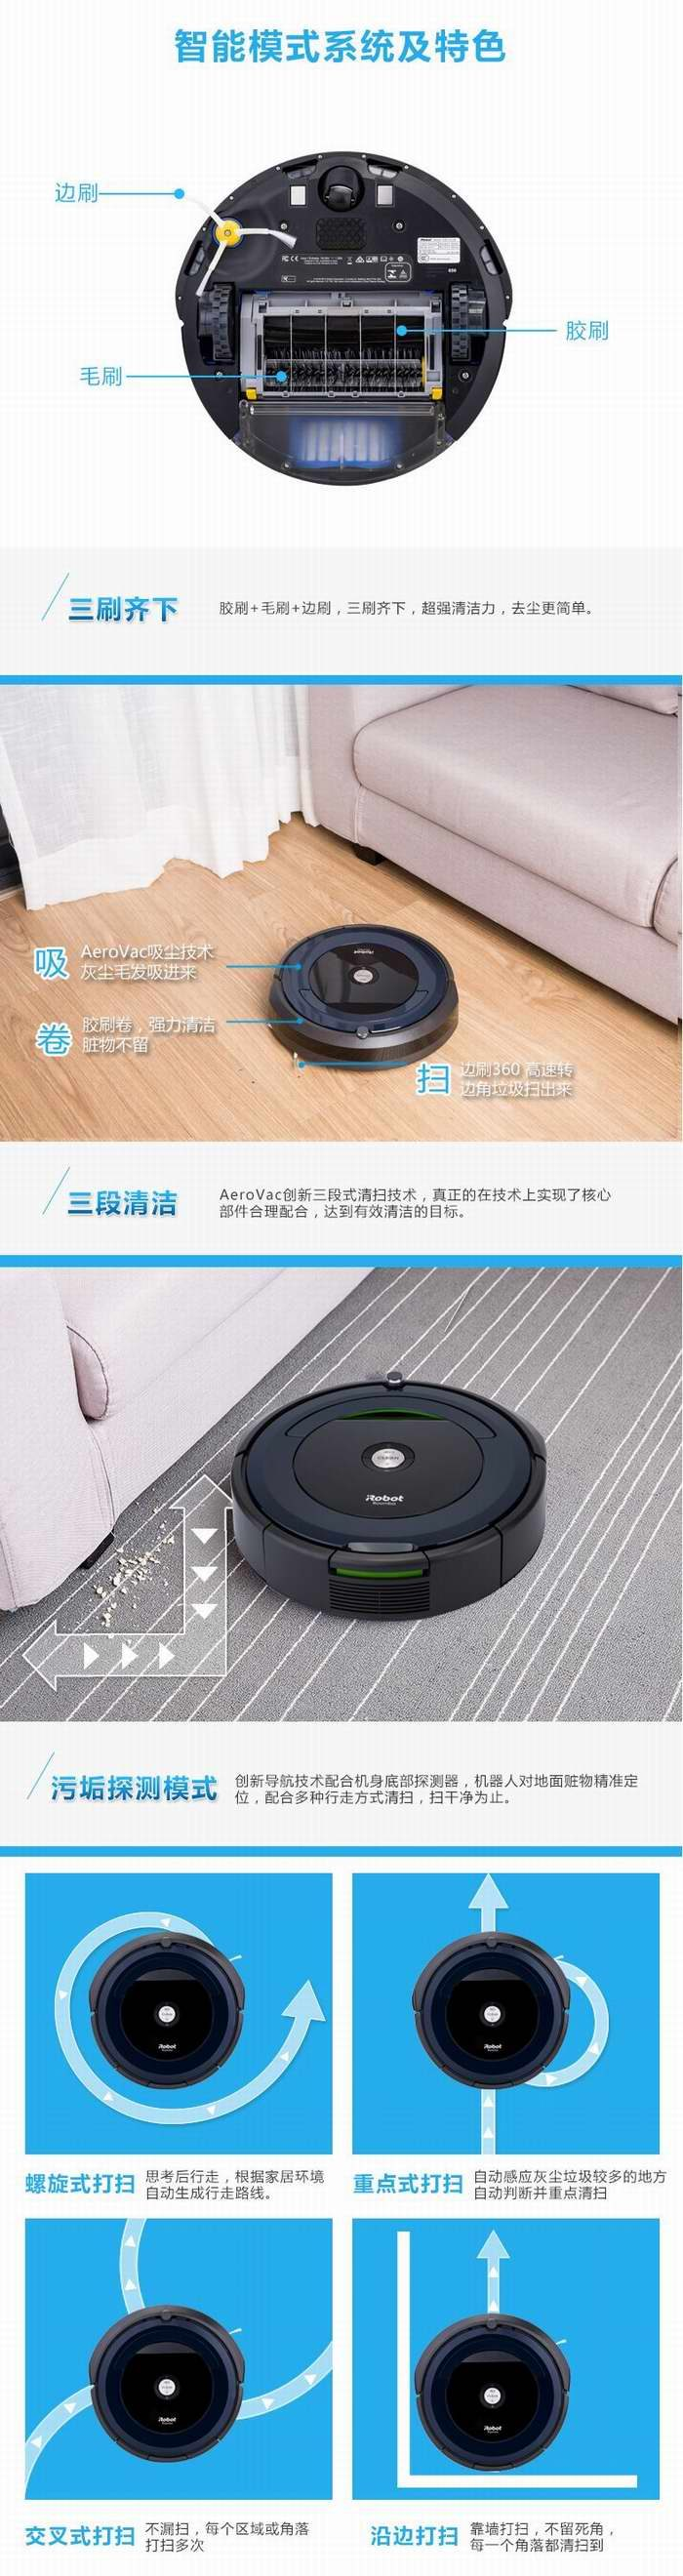 iRobot Roomba 690 Wi-Fi 智能扫地机器人 379.98加元包邮!